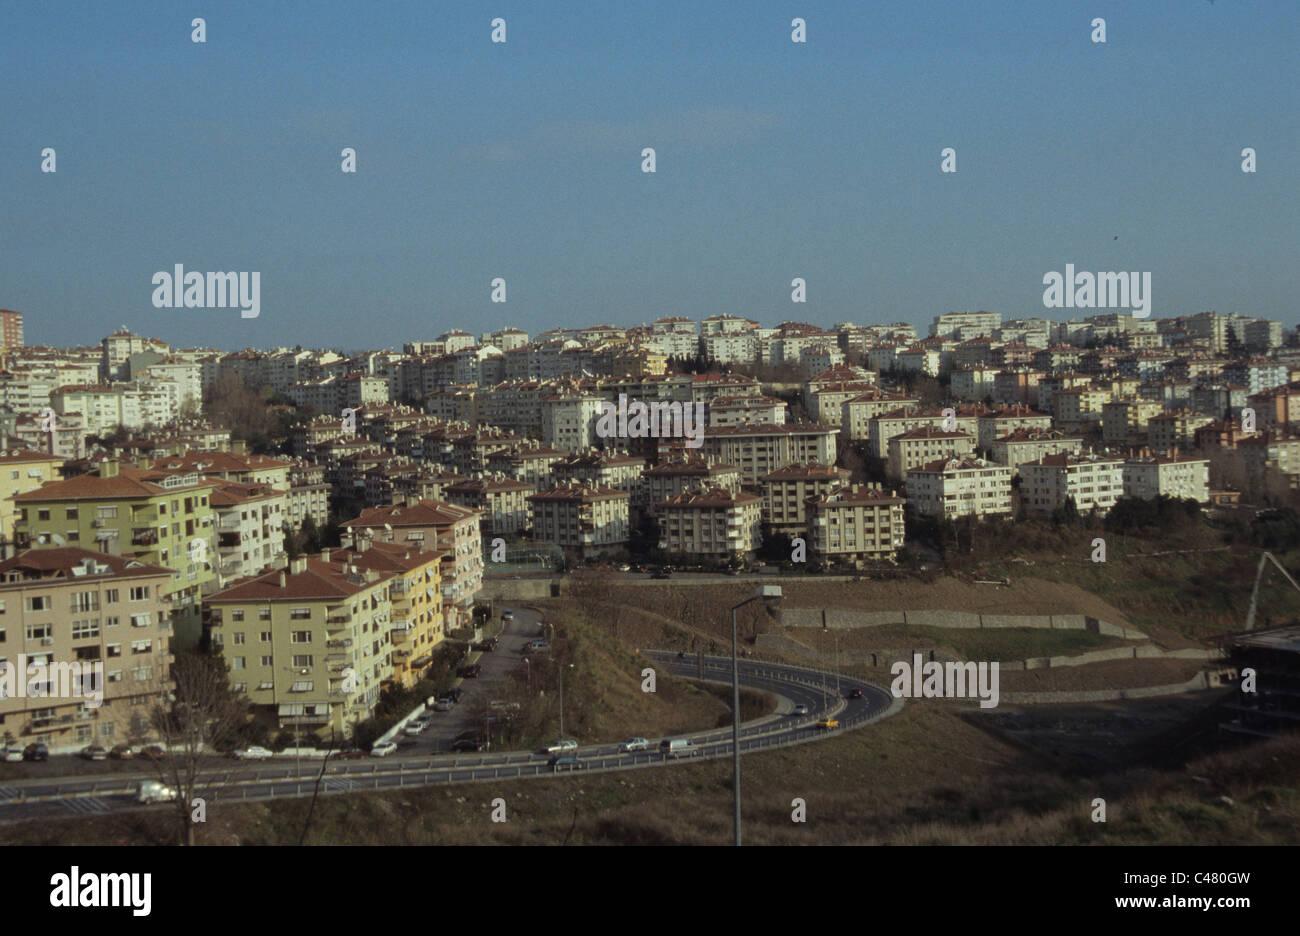 Conurbation of modern blocks of apartment flats Turkey - Stock Image